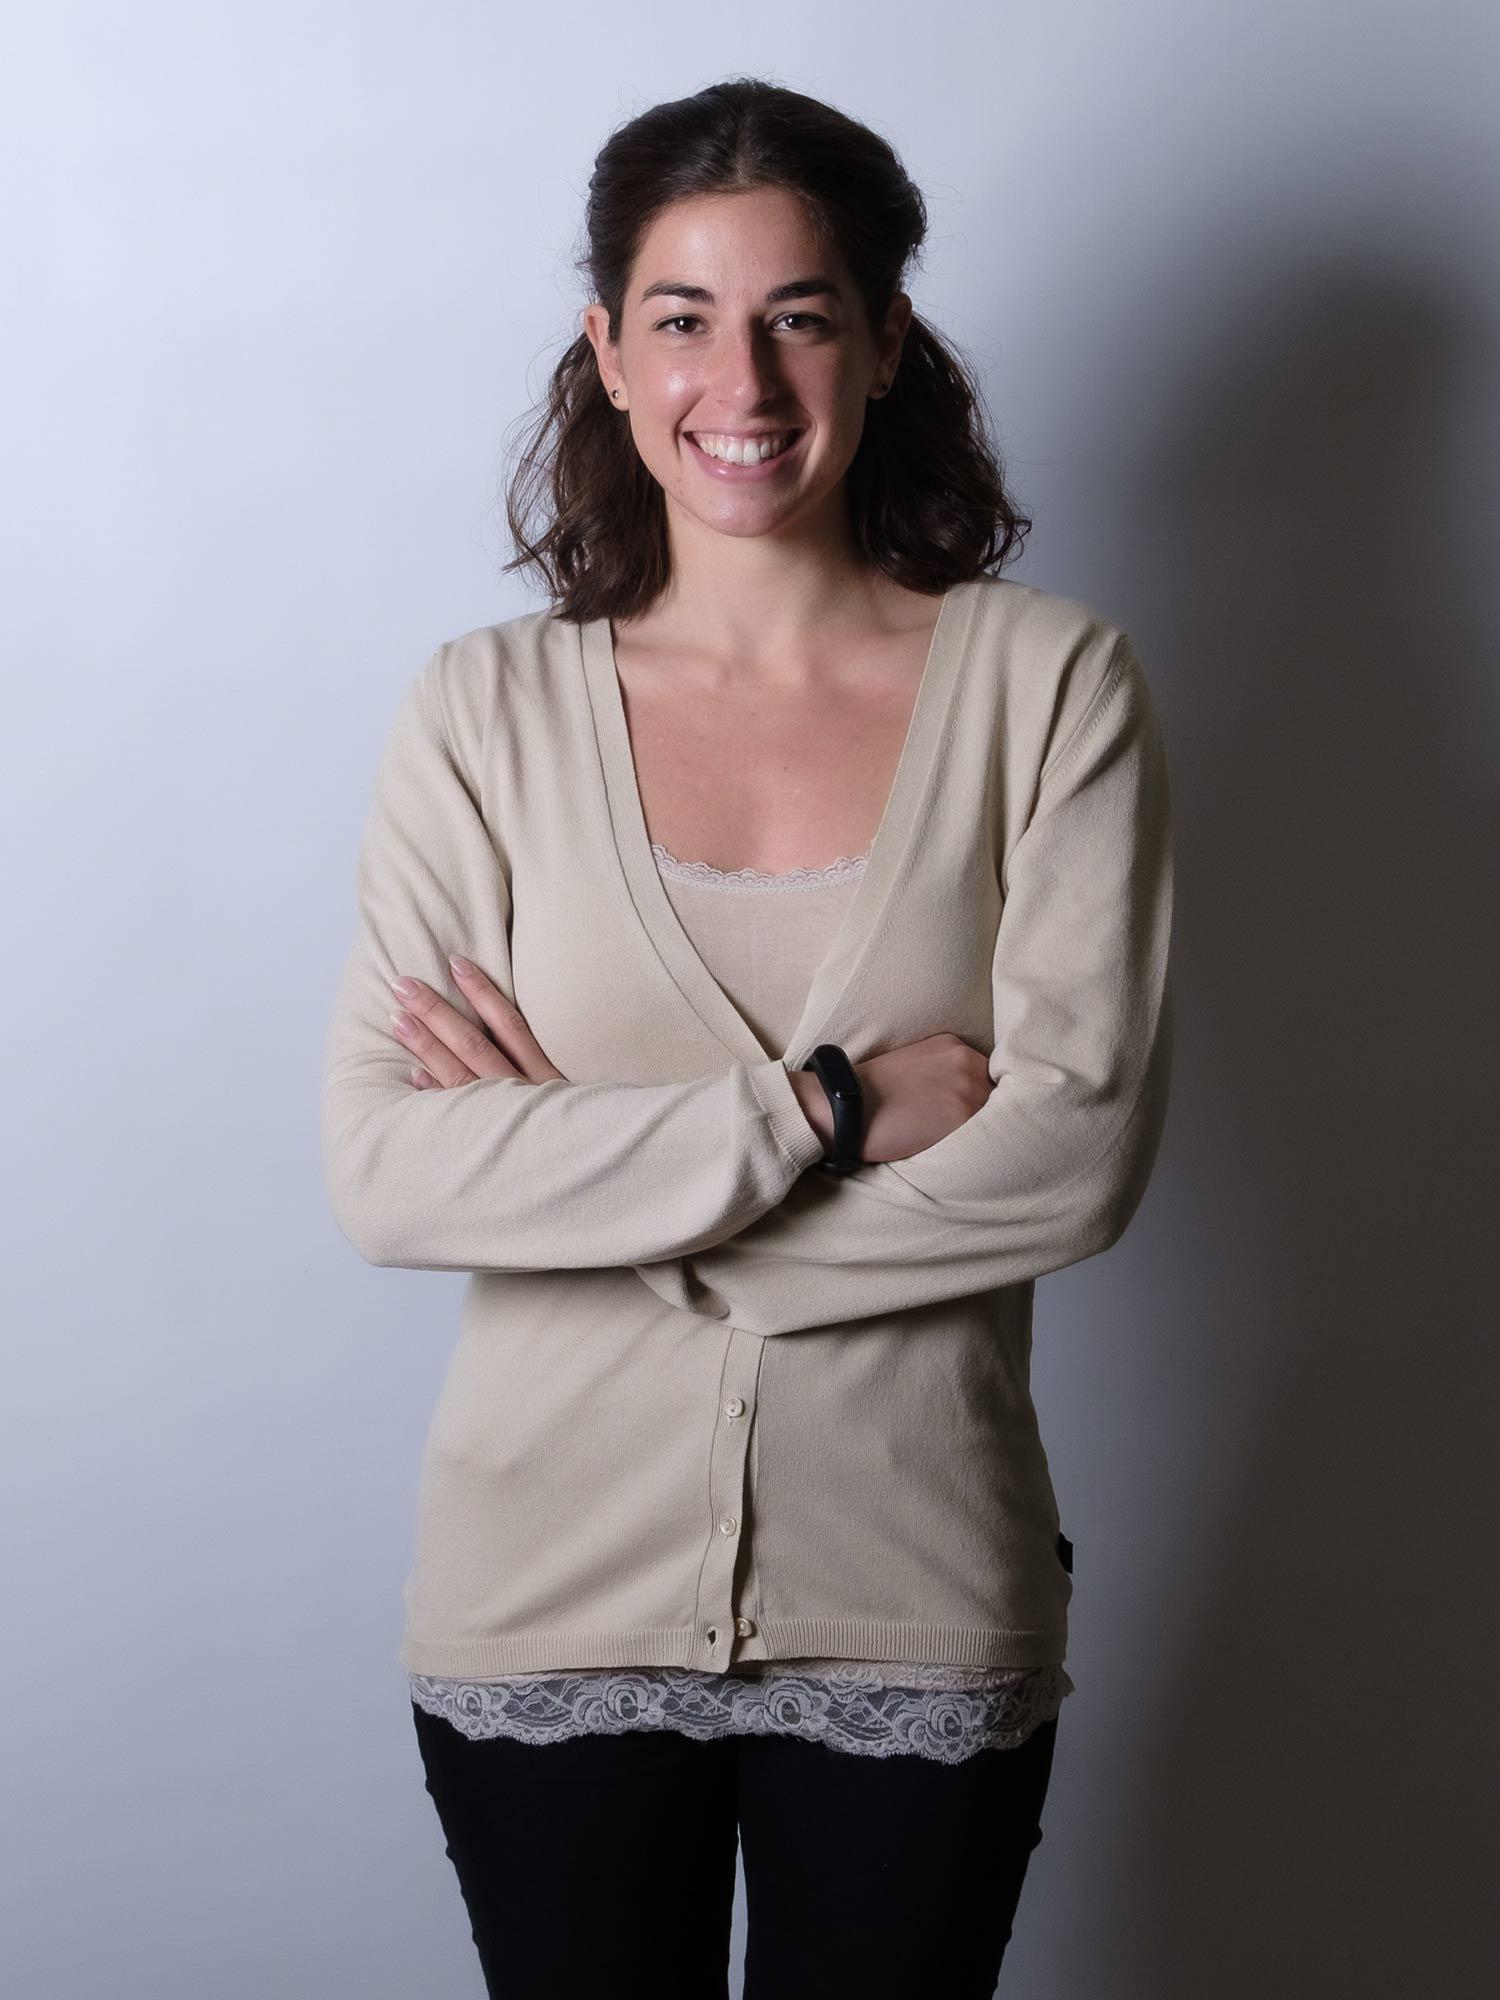 Irene Venturini